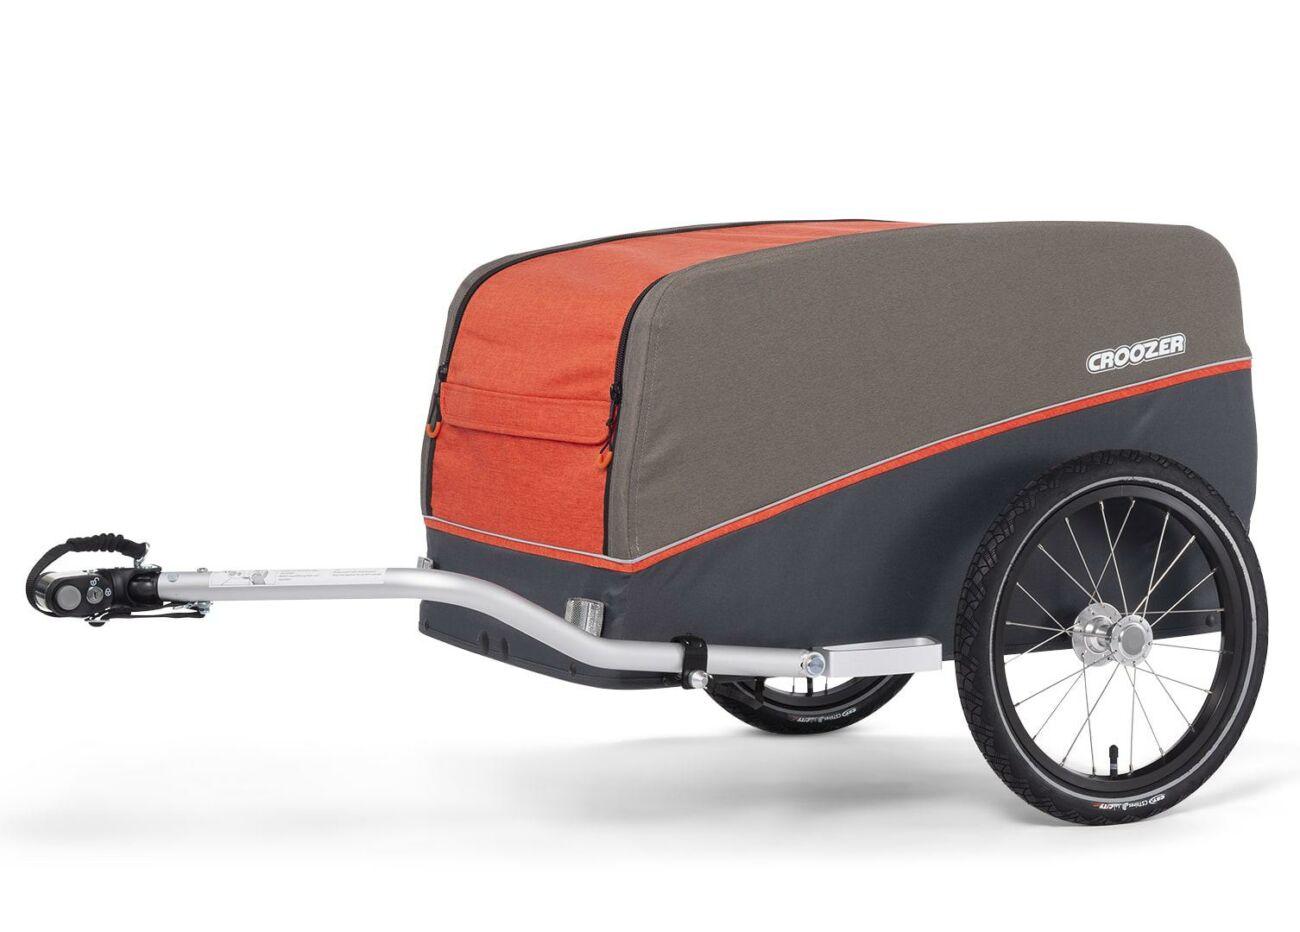 121000518 Croozer Cargo Pakko Campfire Red 2020 Web